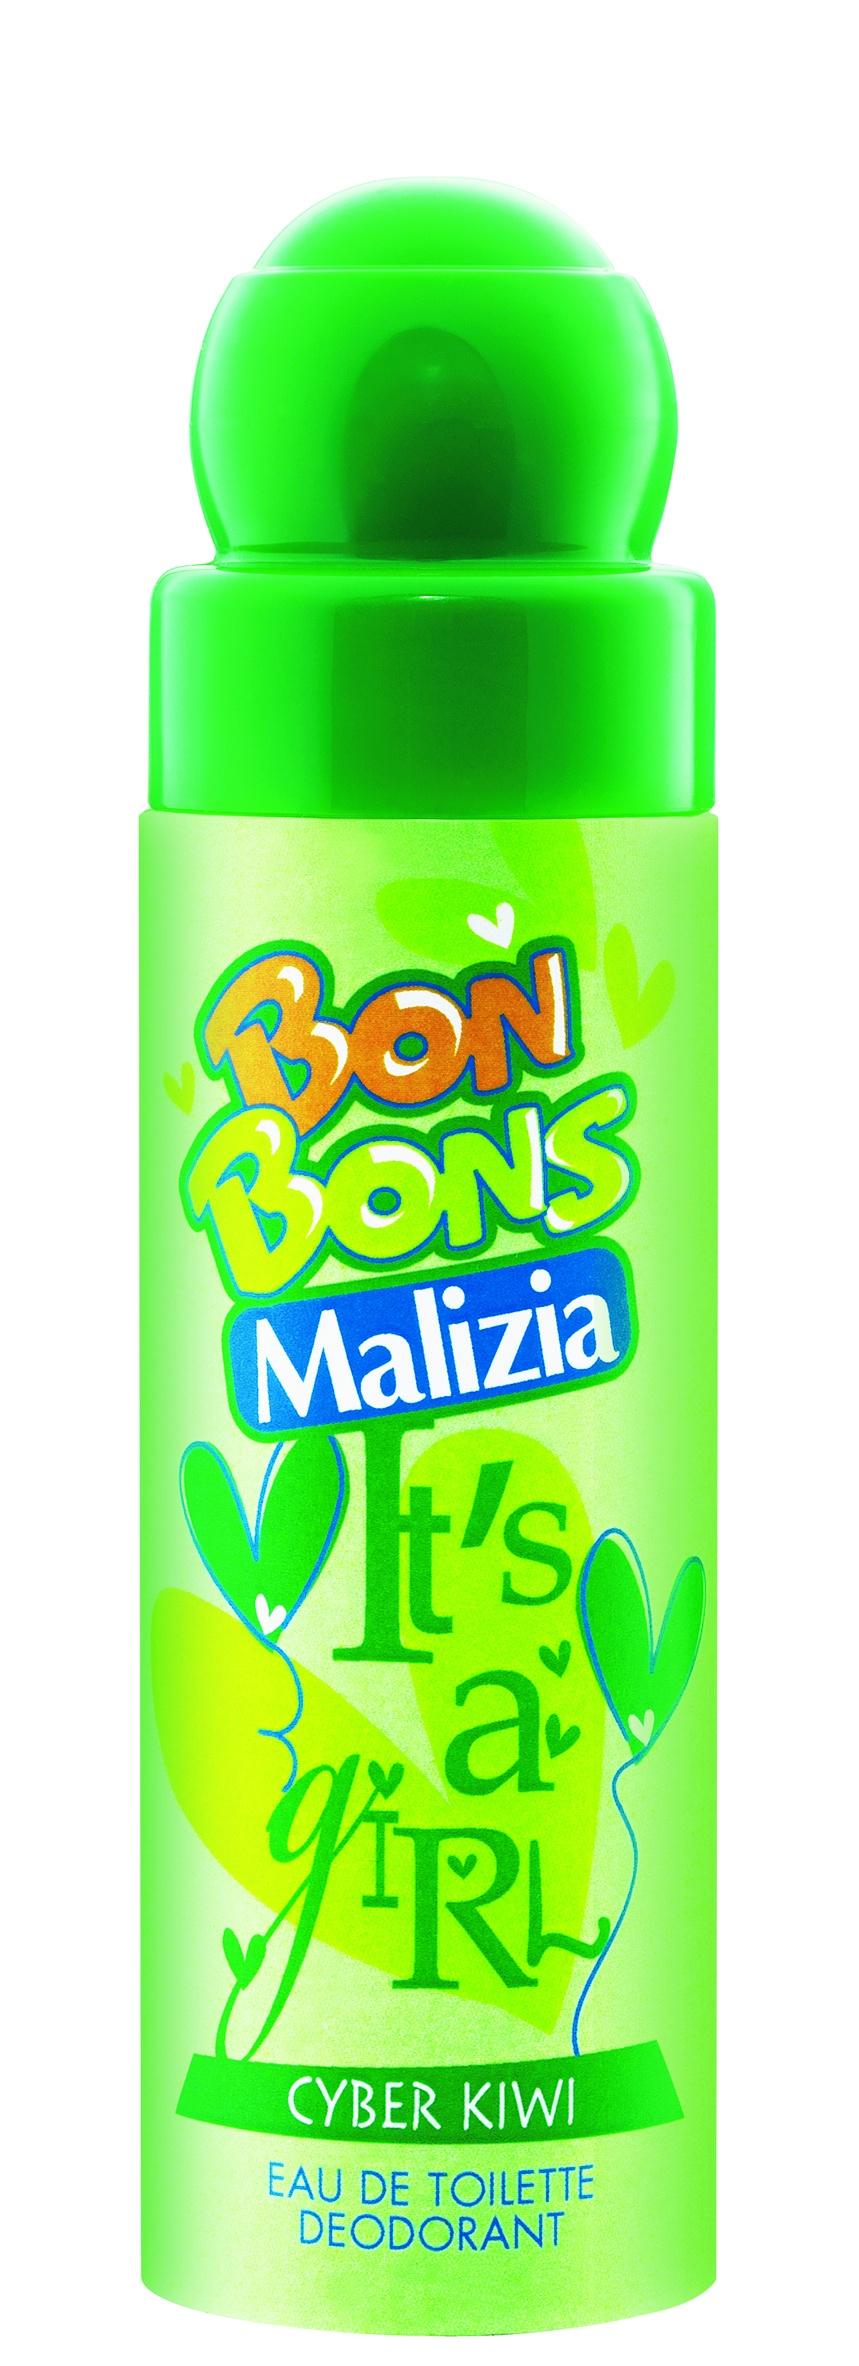 Дезодорант Malizia CYBER KIWI 75 мл цены онлайн